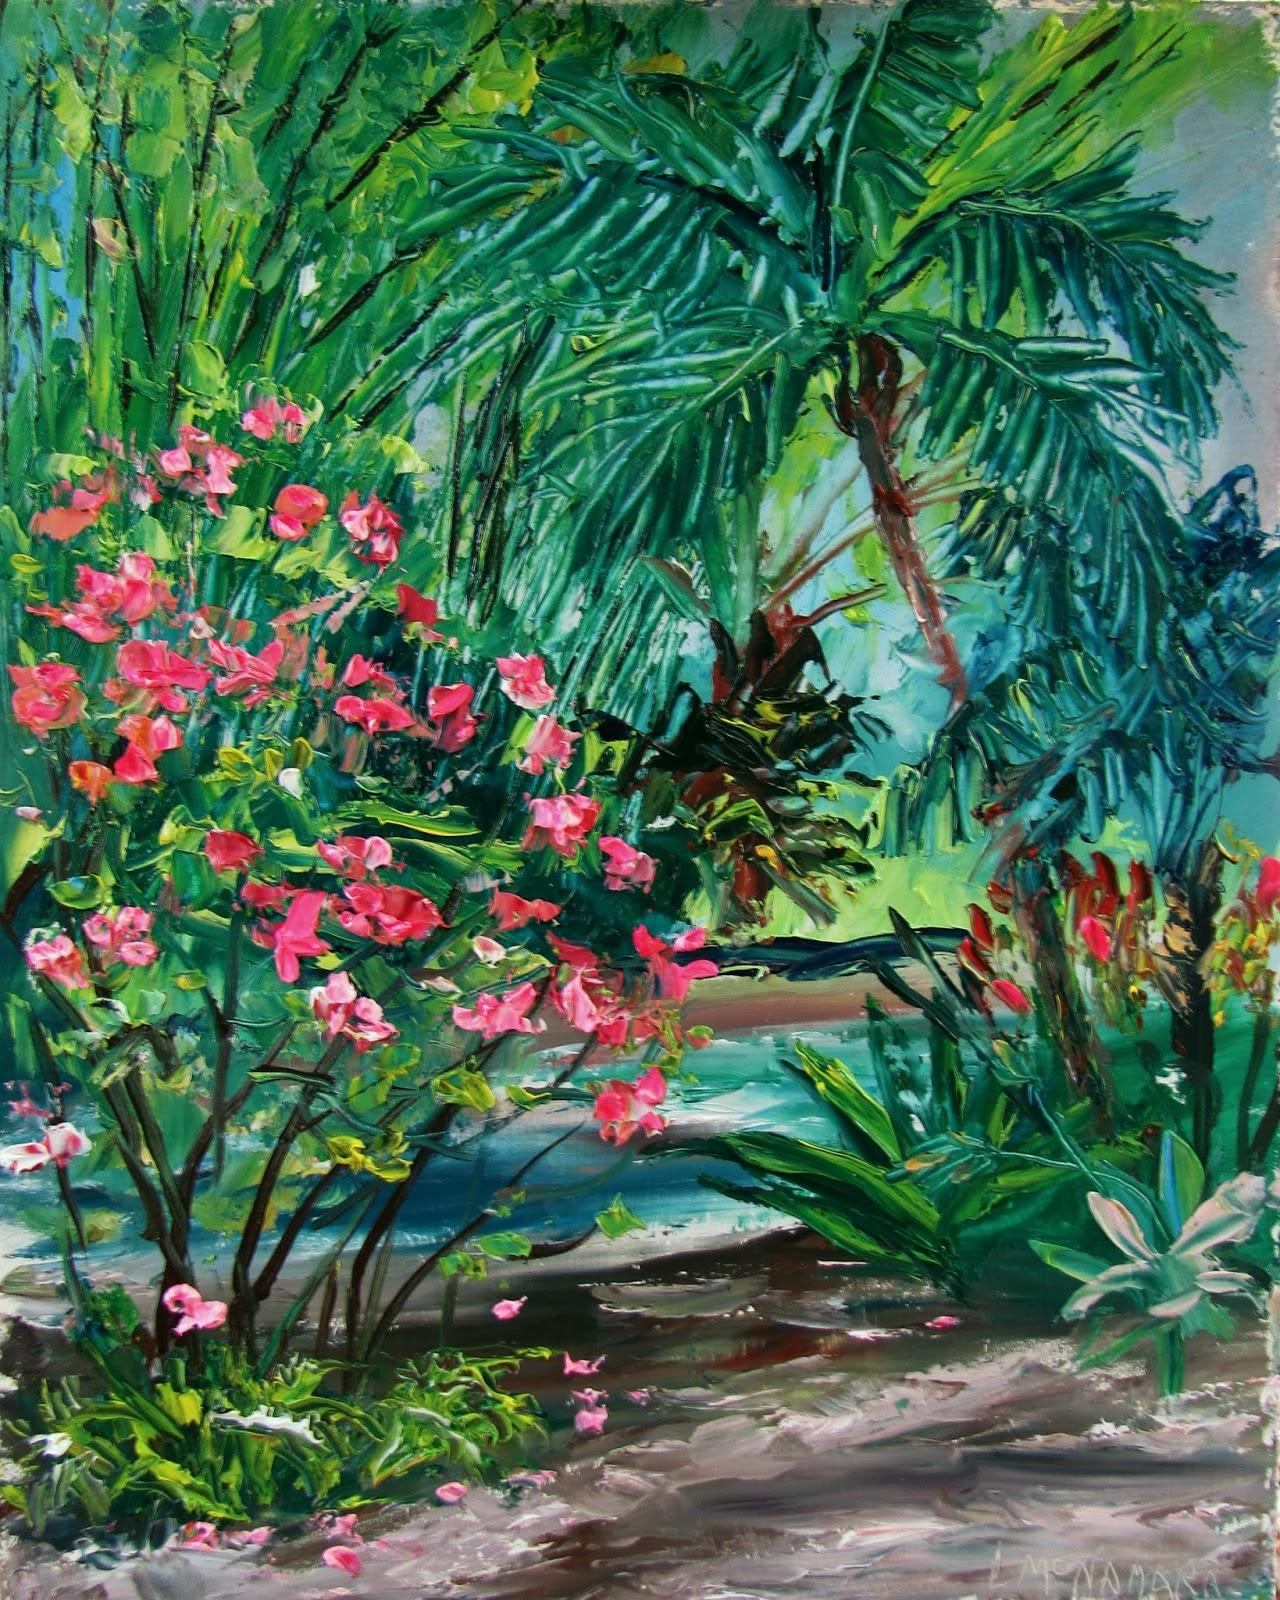 Heathcote Botanical Gardens: Lori's Stormy Art And Daily Paintings: 1593 SOLD Azaleas